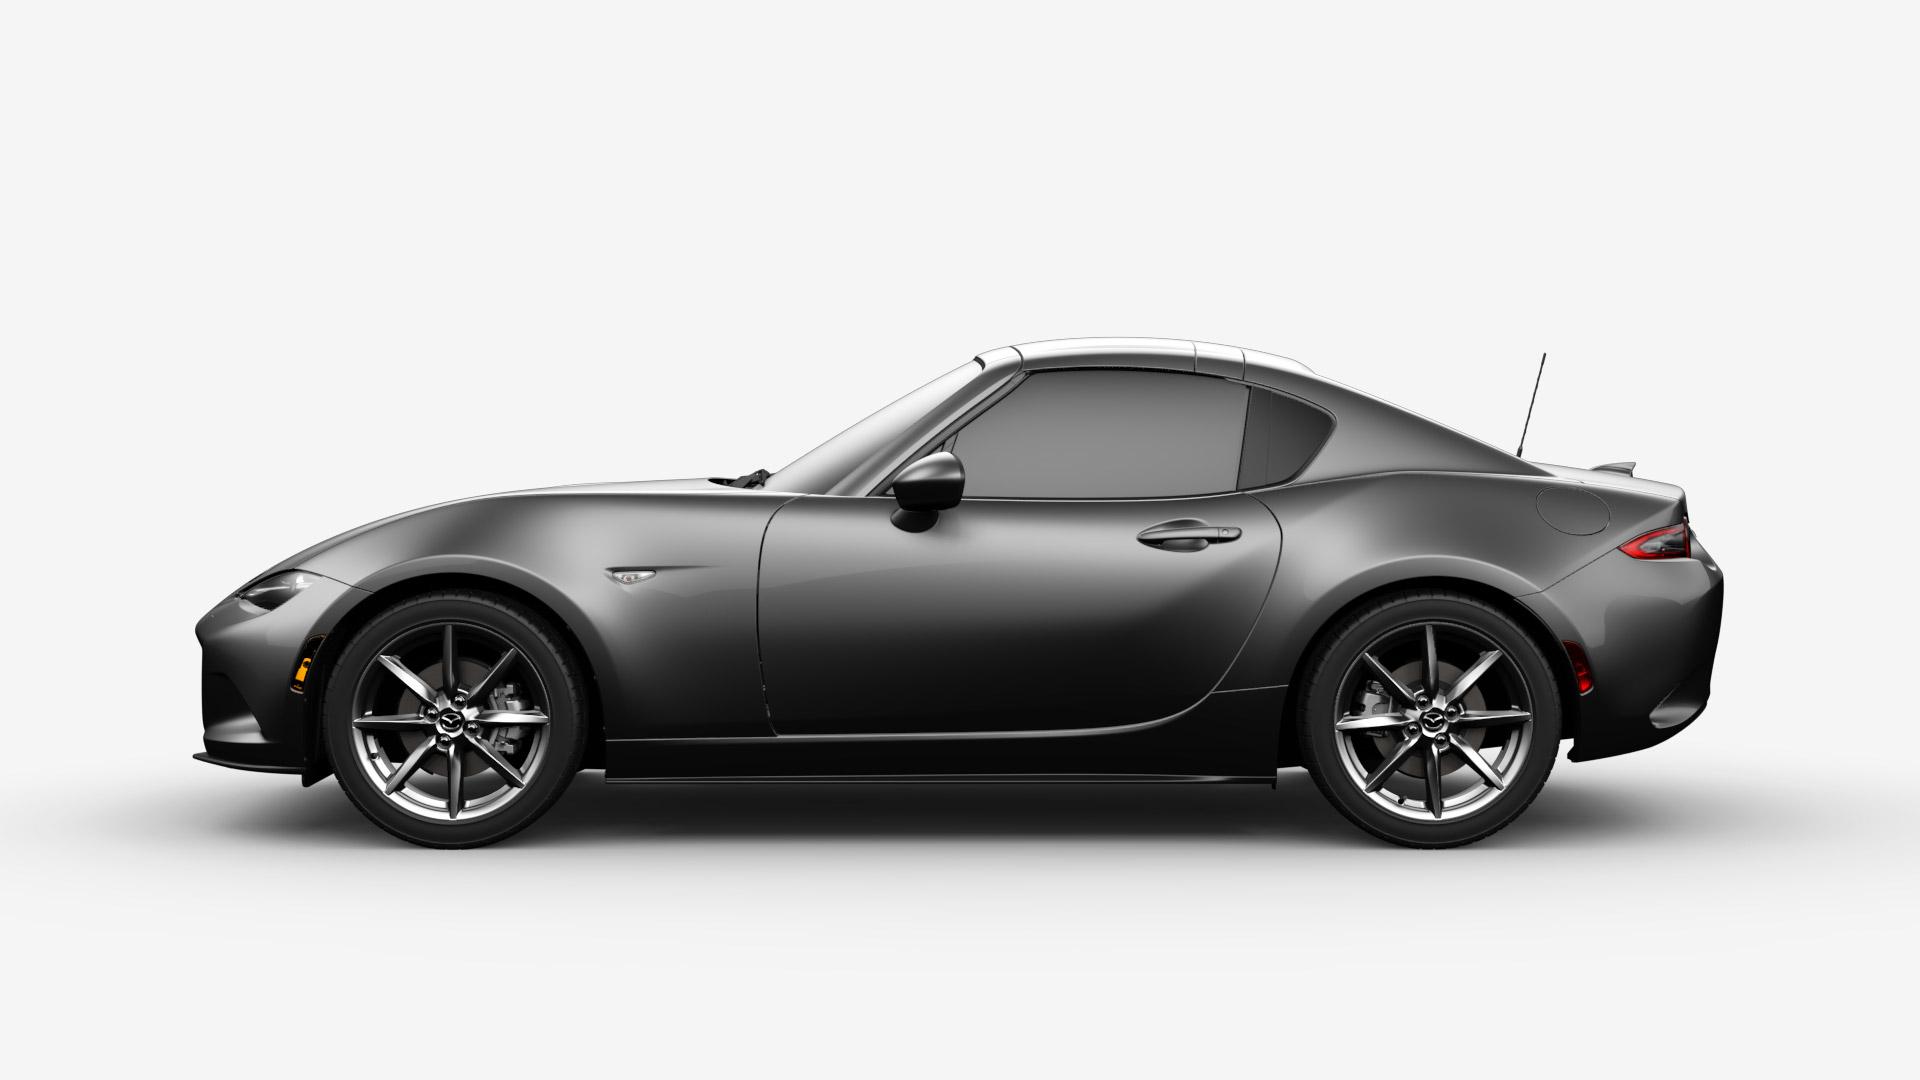 2017 Mazda MX 5 Miata RF Hard Top Convertible